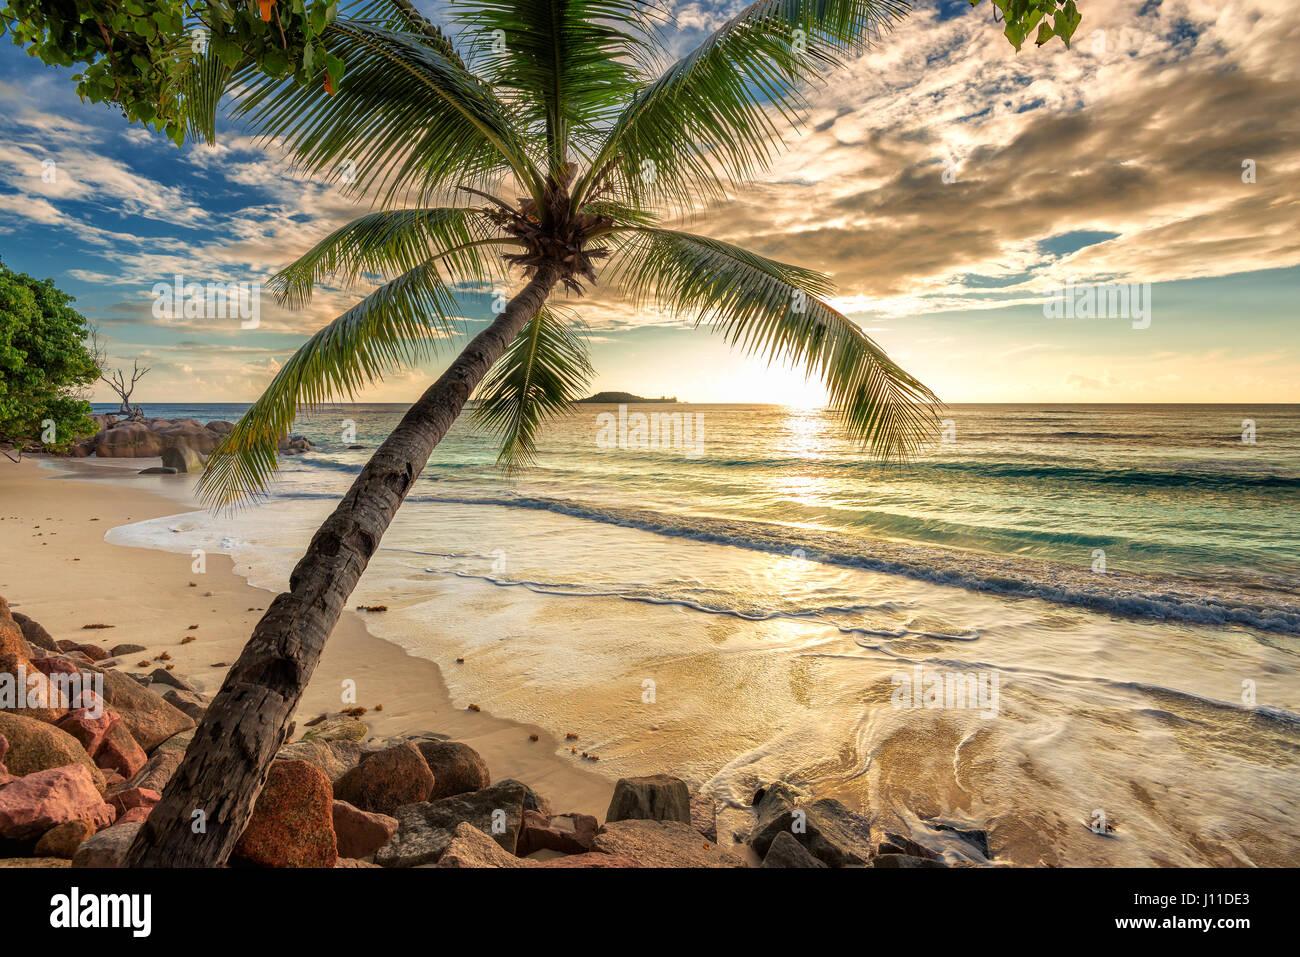 Art Beautiful Sunset at tropical beach. - Stock Image